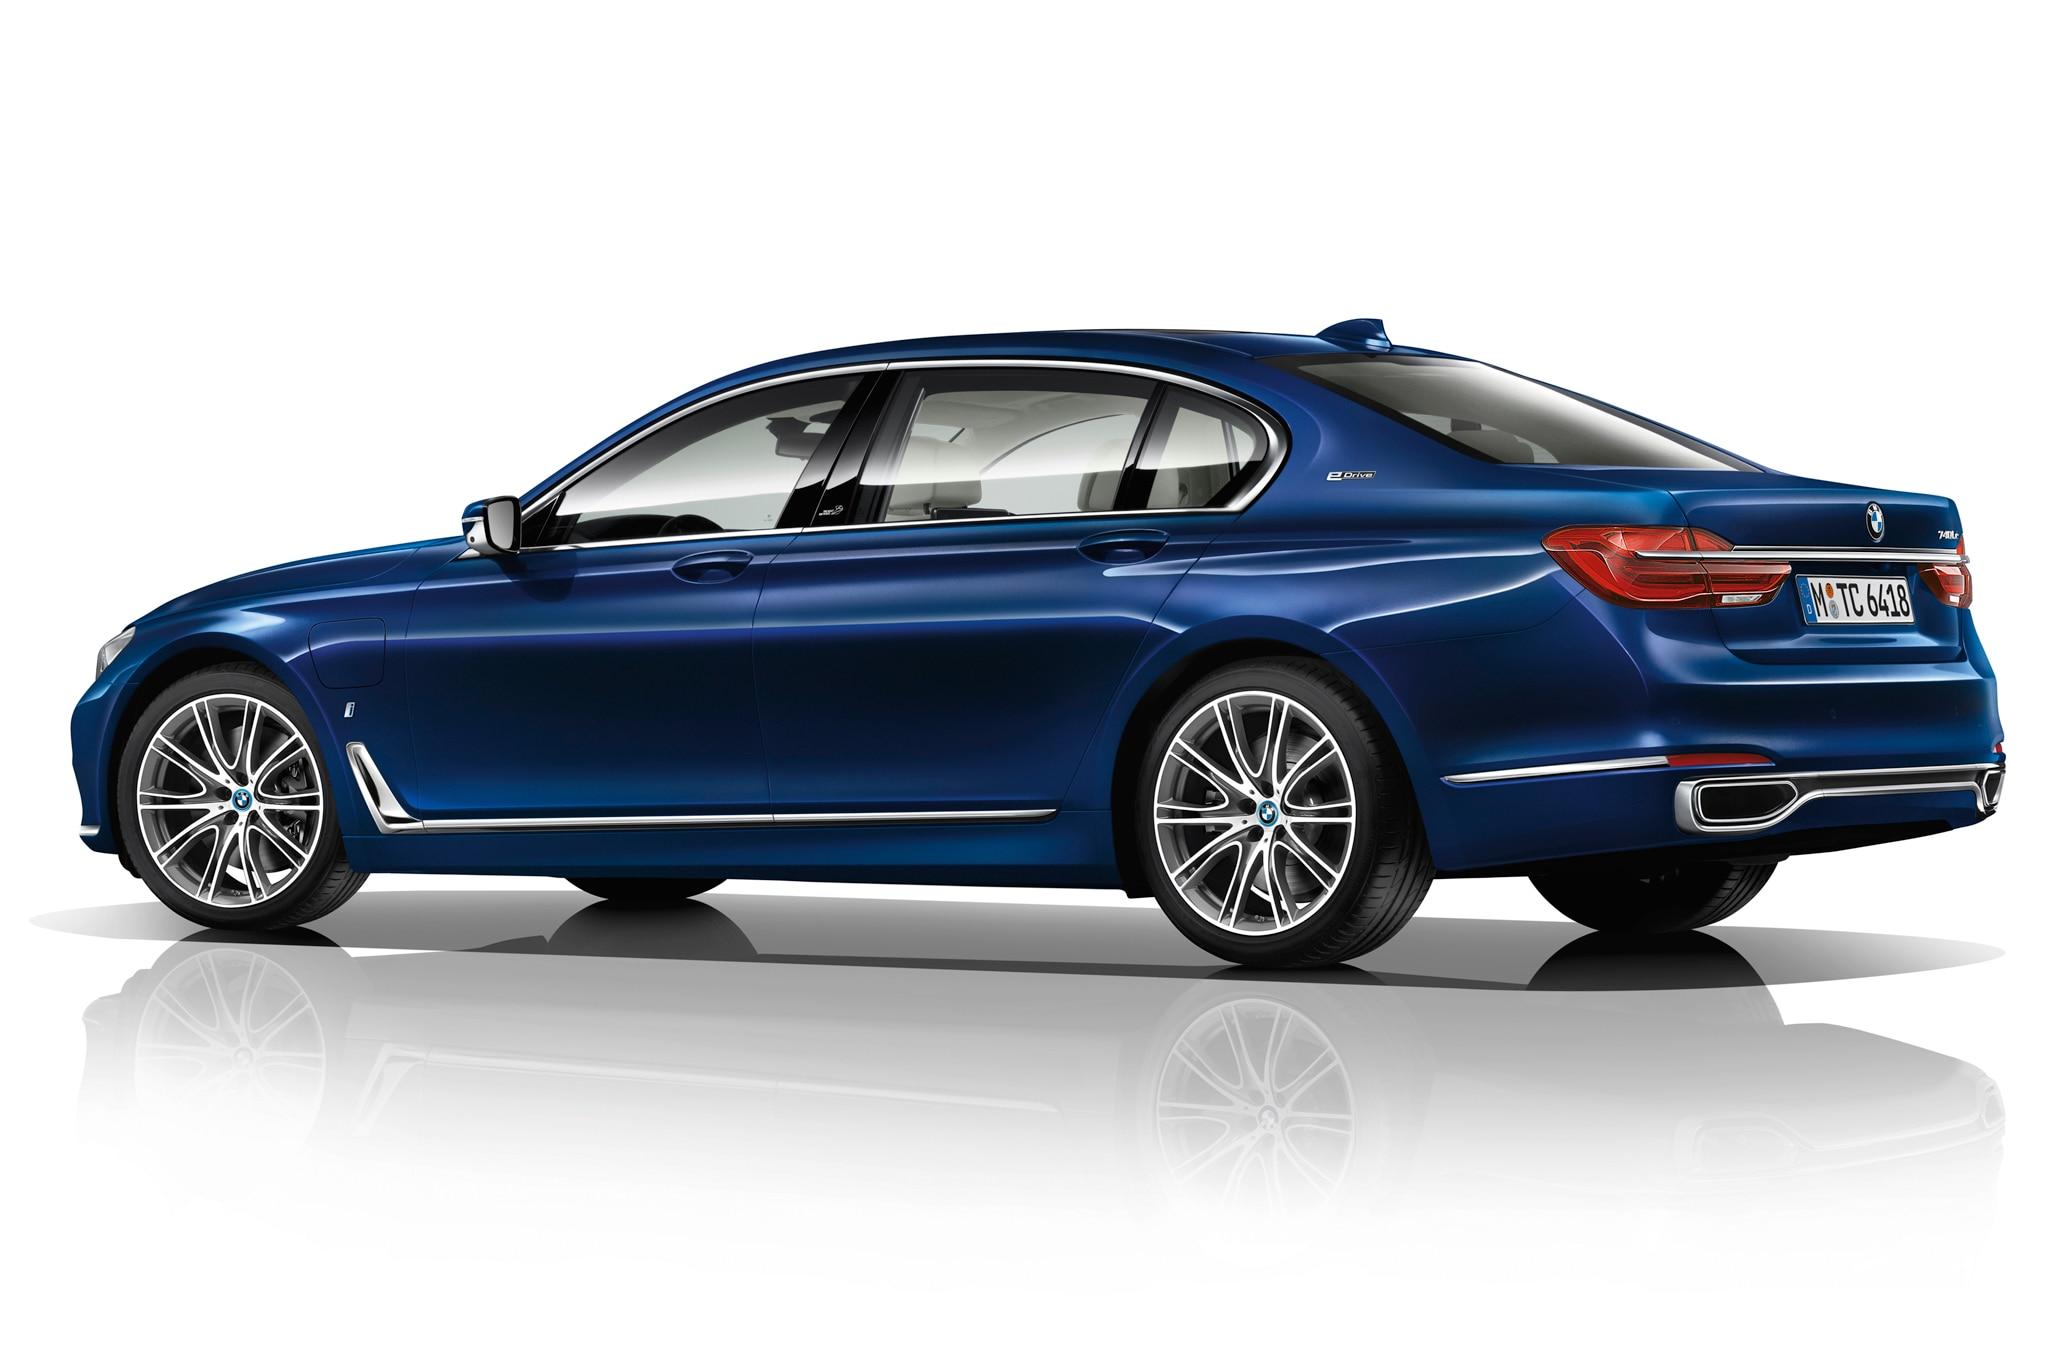 2bdc22b89628 Special-Edition 7 Series Celebrates BMW s Centennial